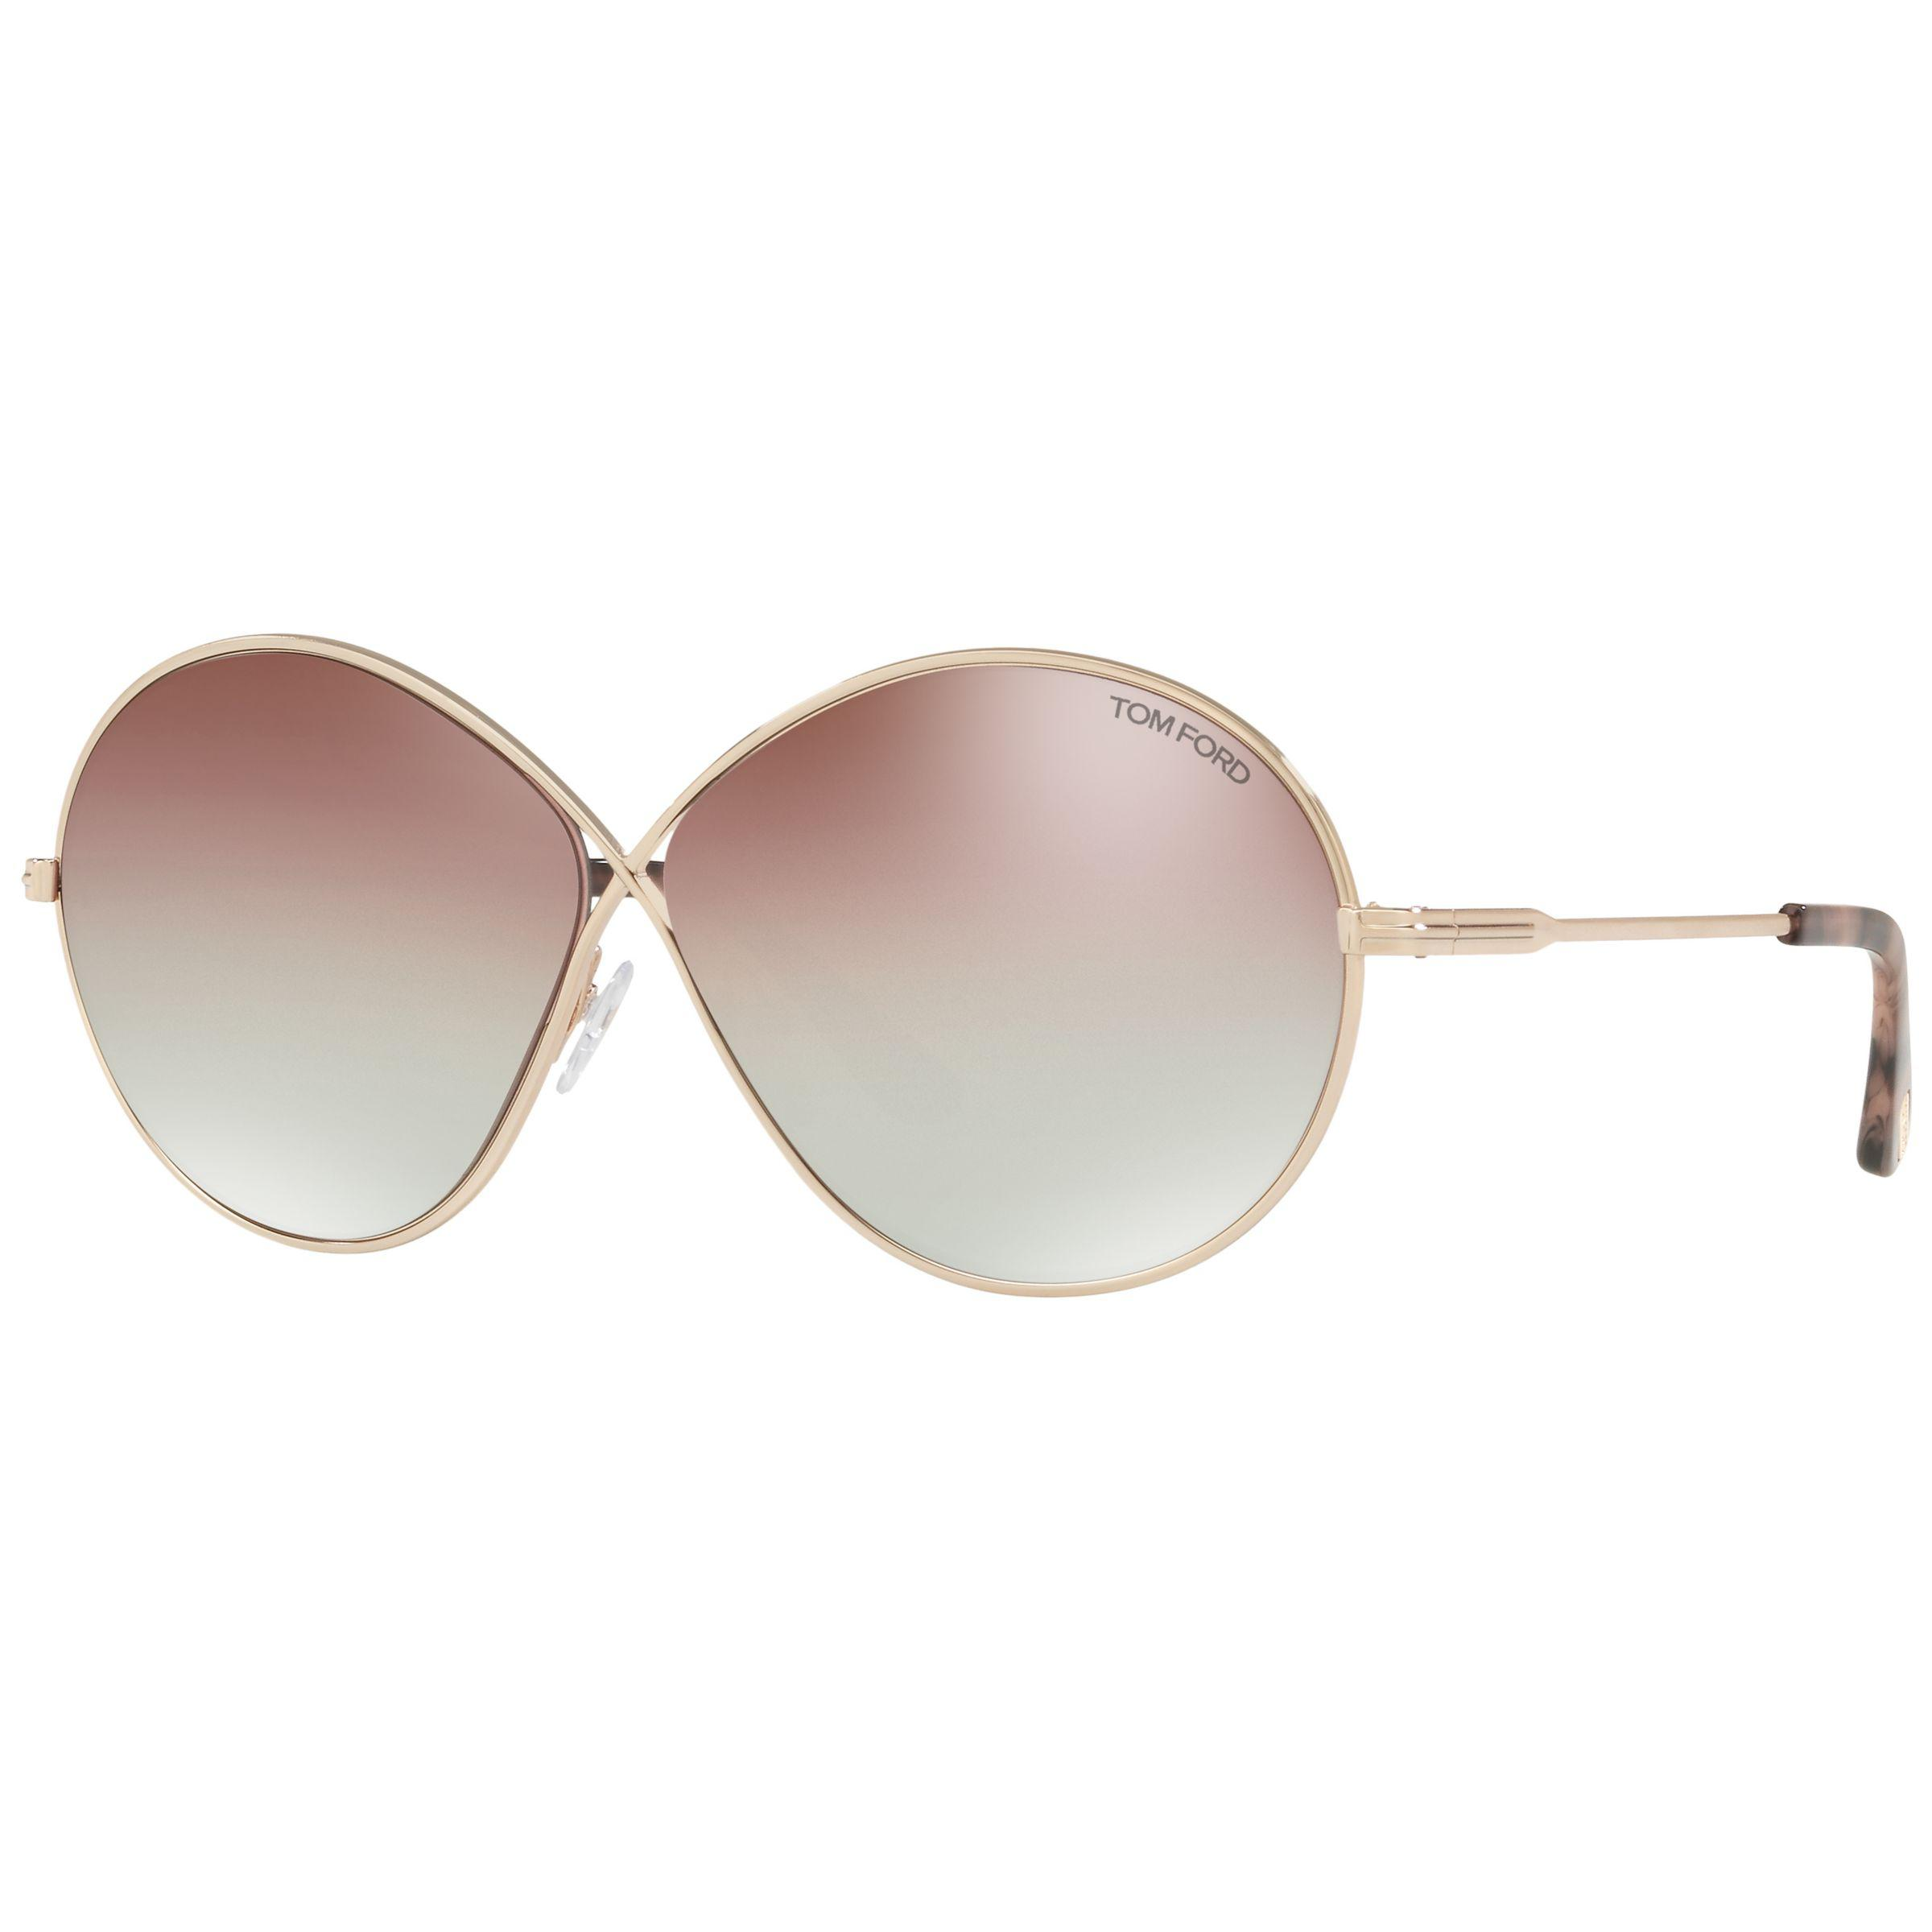 79c8f1dfcc2d2 Tom Ford - Multicolor Ft0564 Rania-02 Oval Sunglasses - Lyst. View  fullscreen